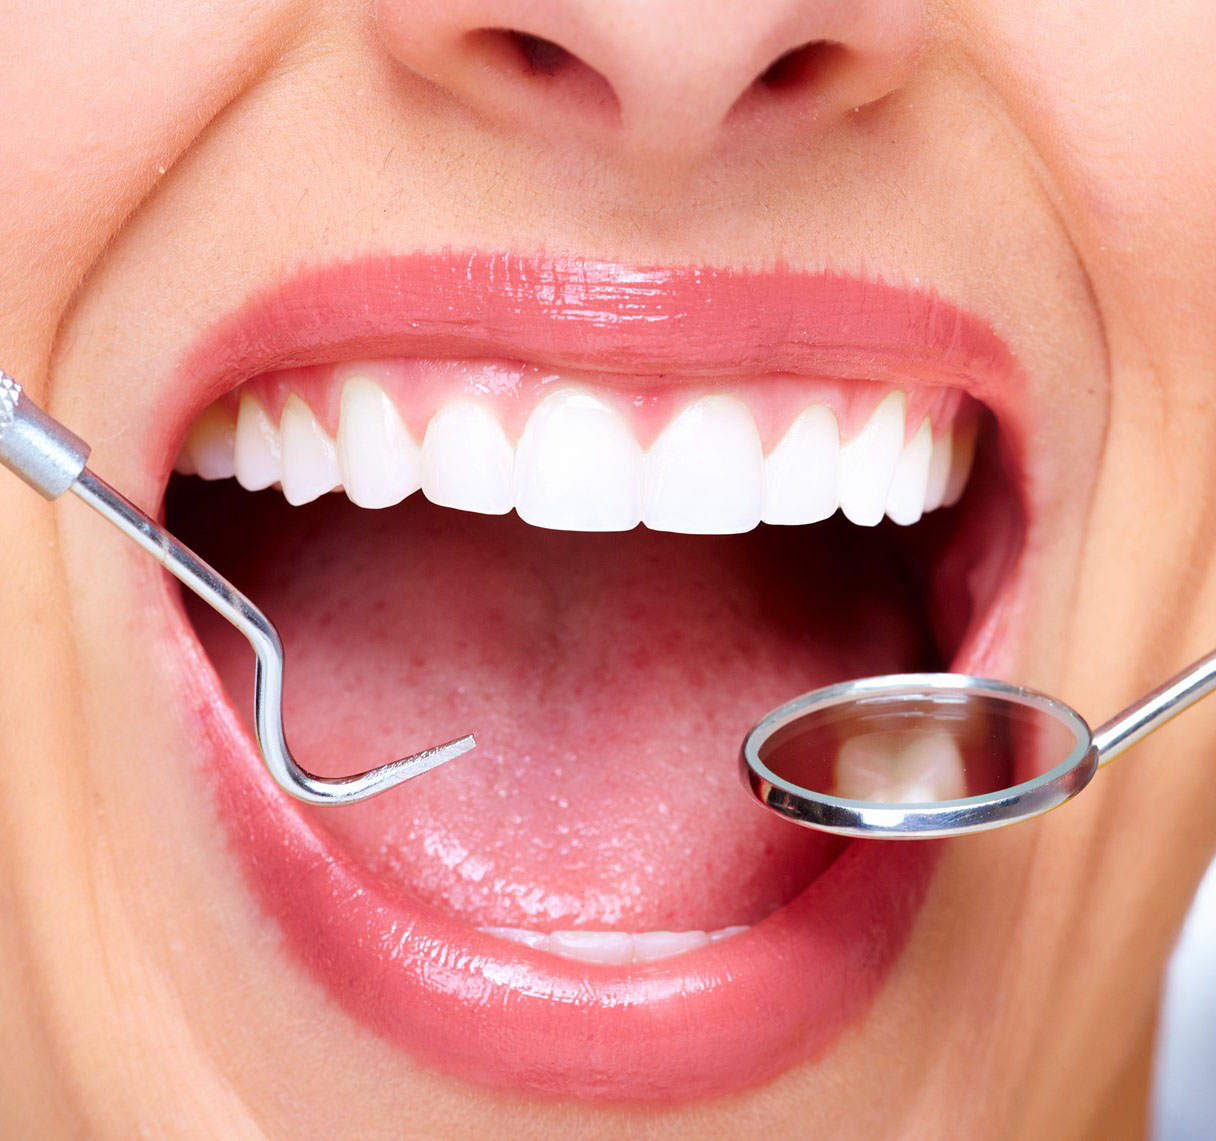 Dental Implants Cost in Dubai